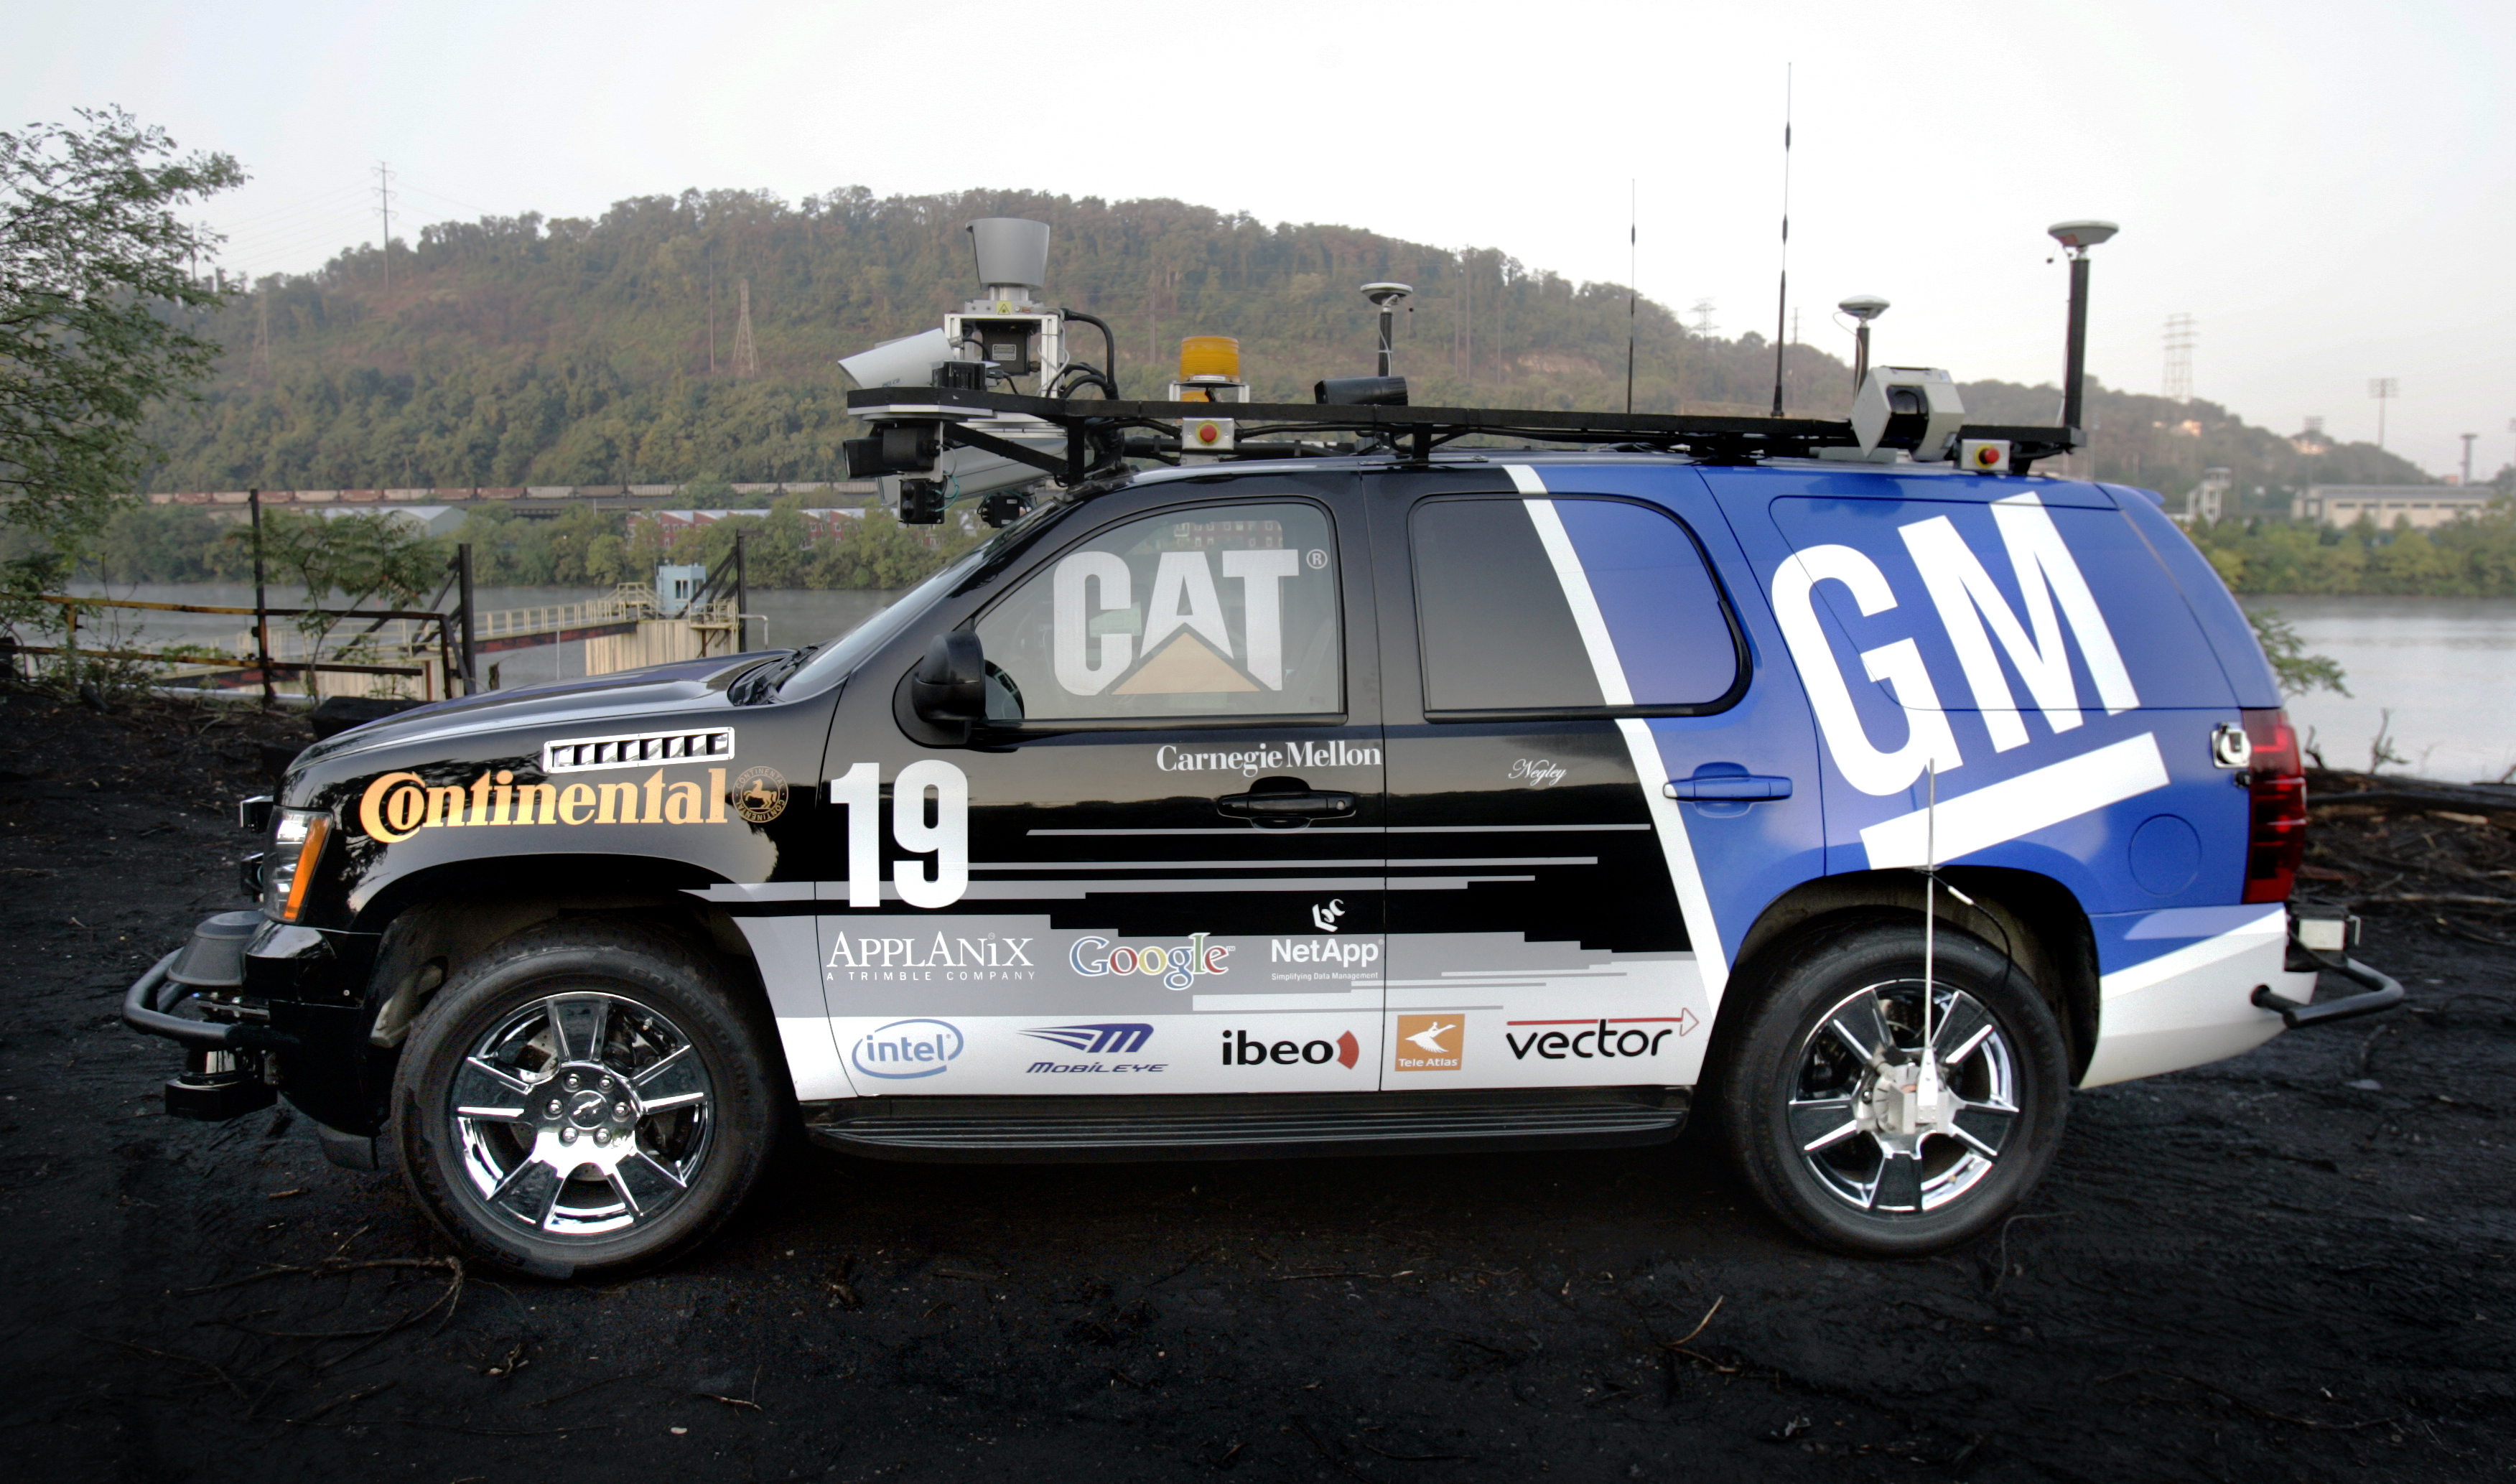 Cmu Self Driving Car Team